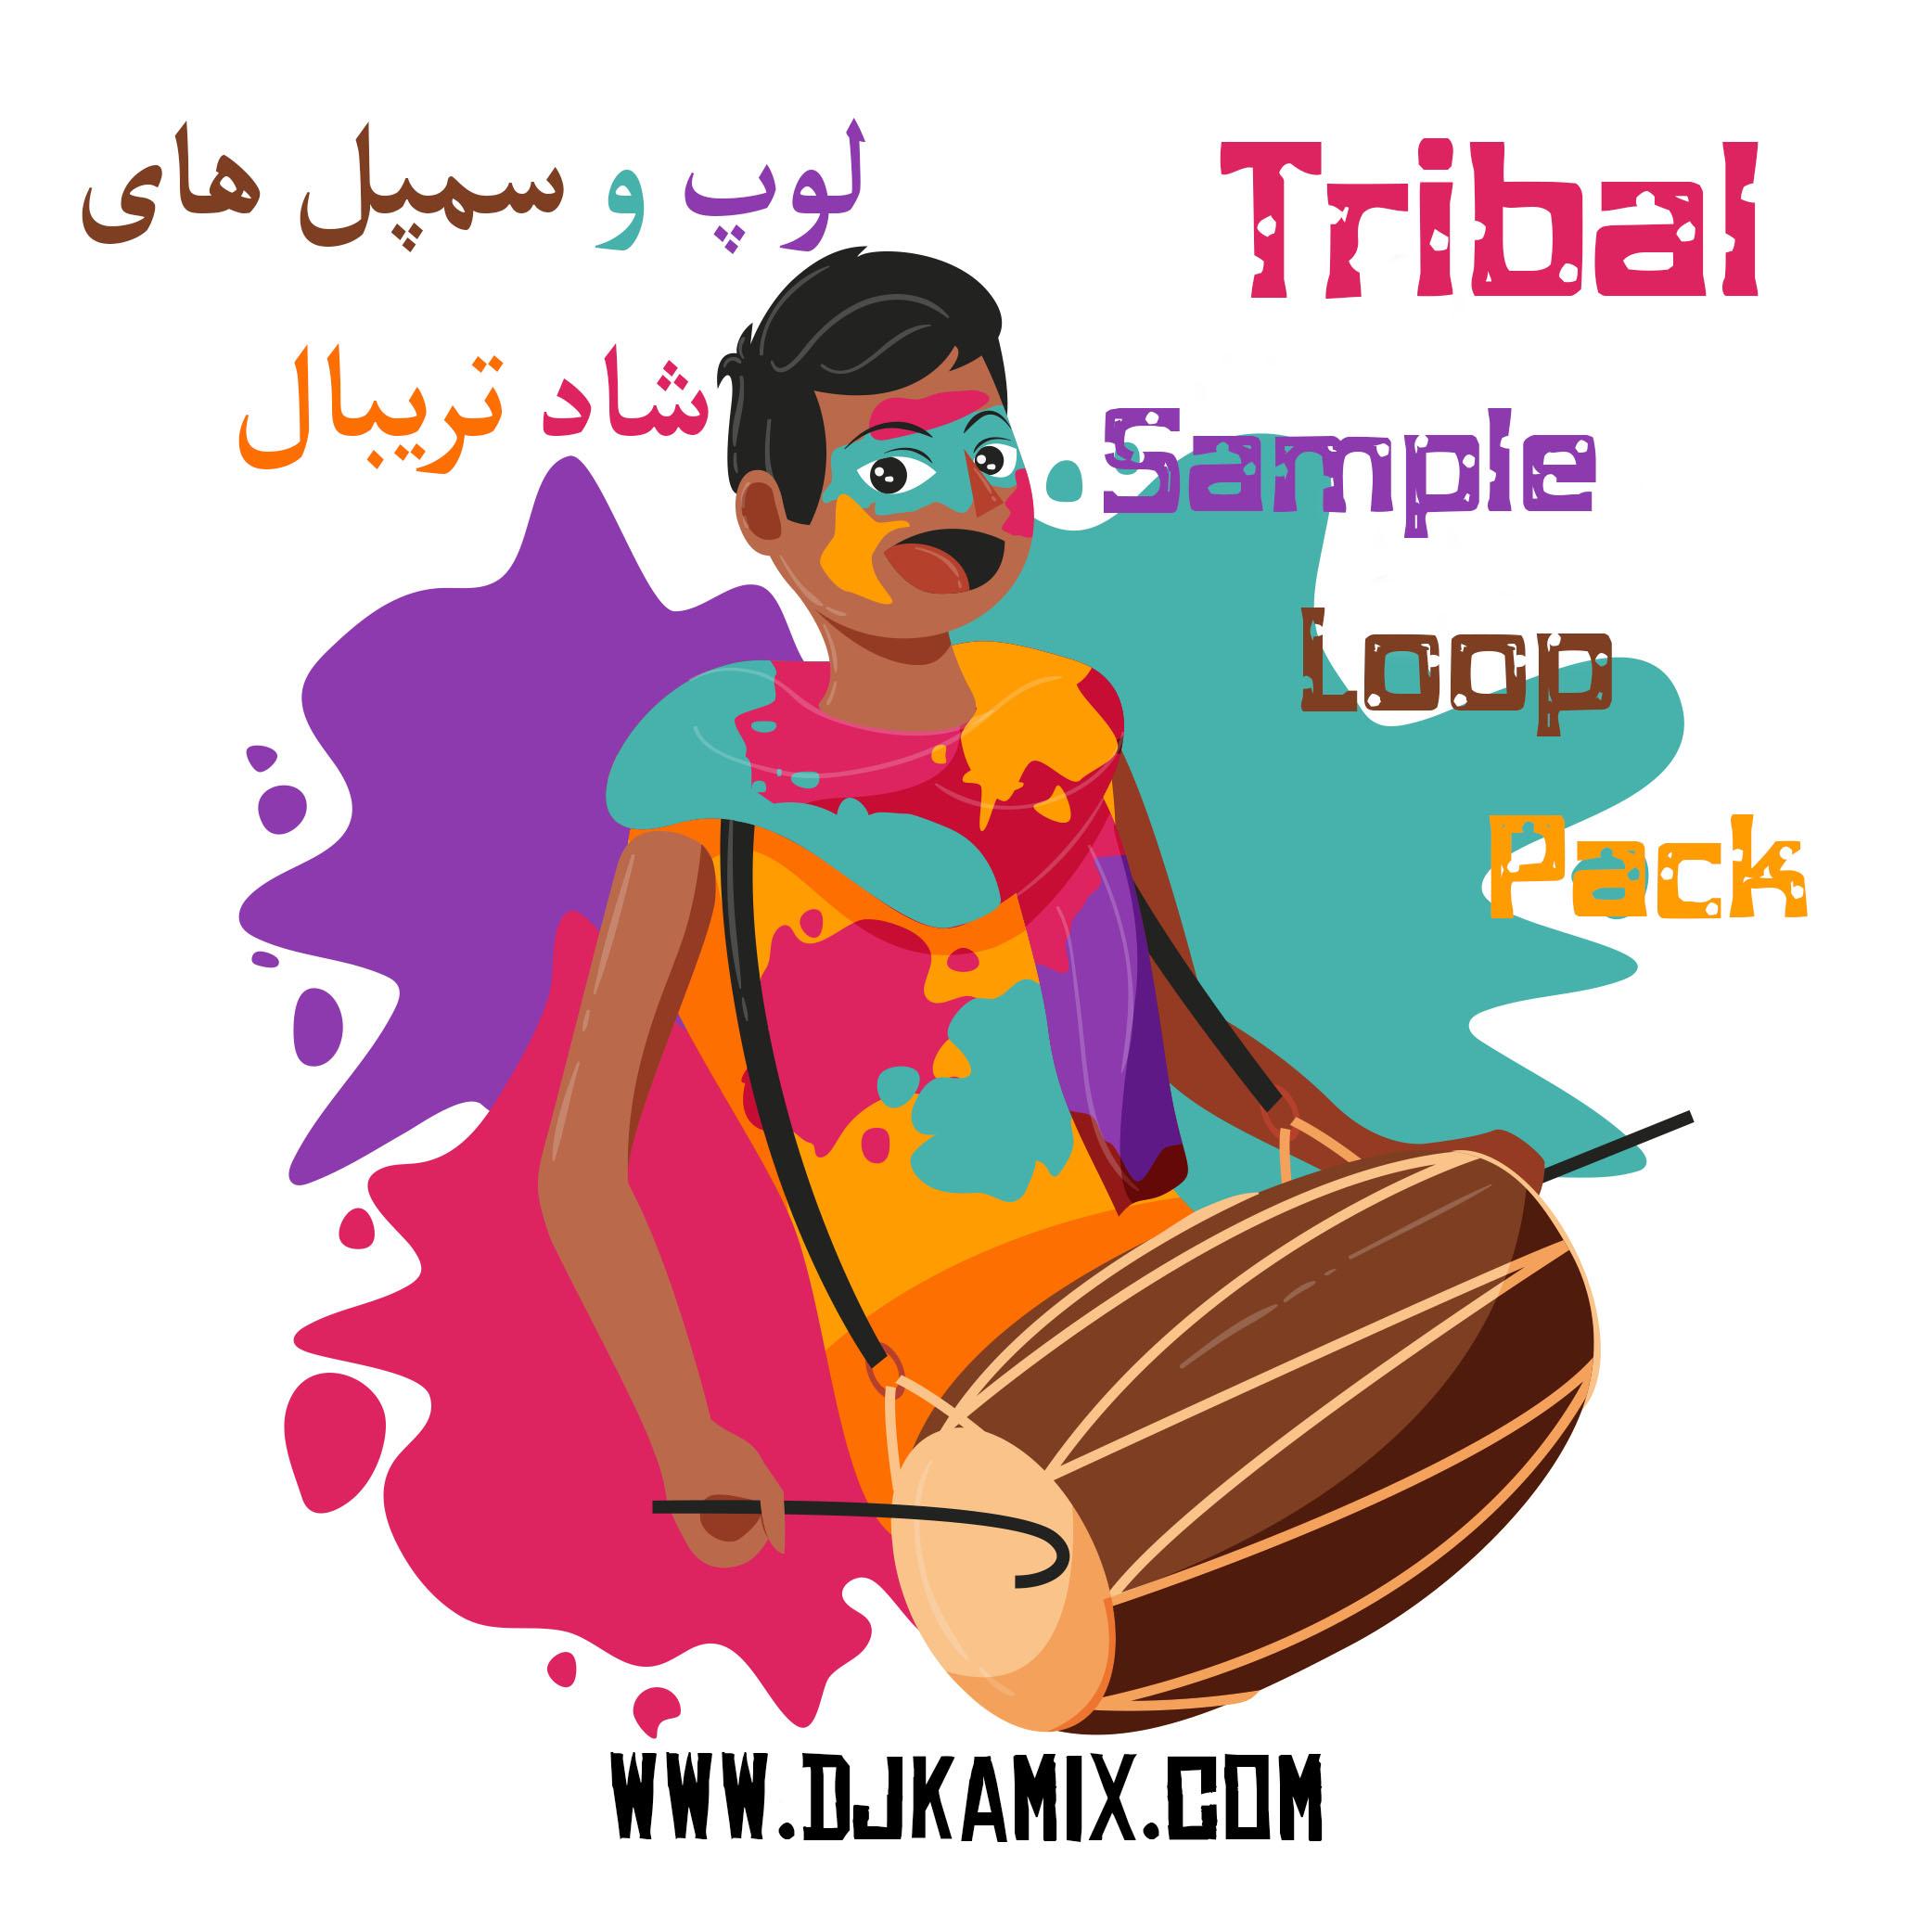 Download Tribal Sound